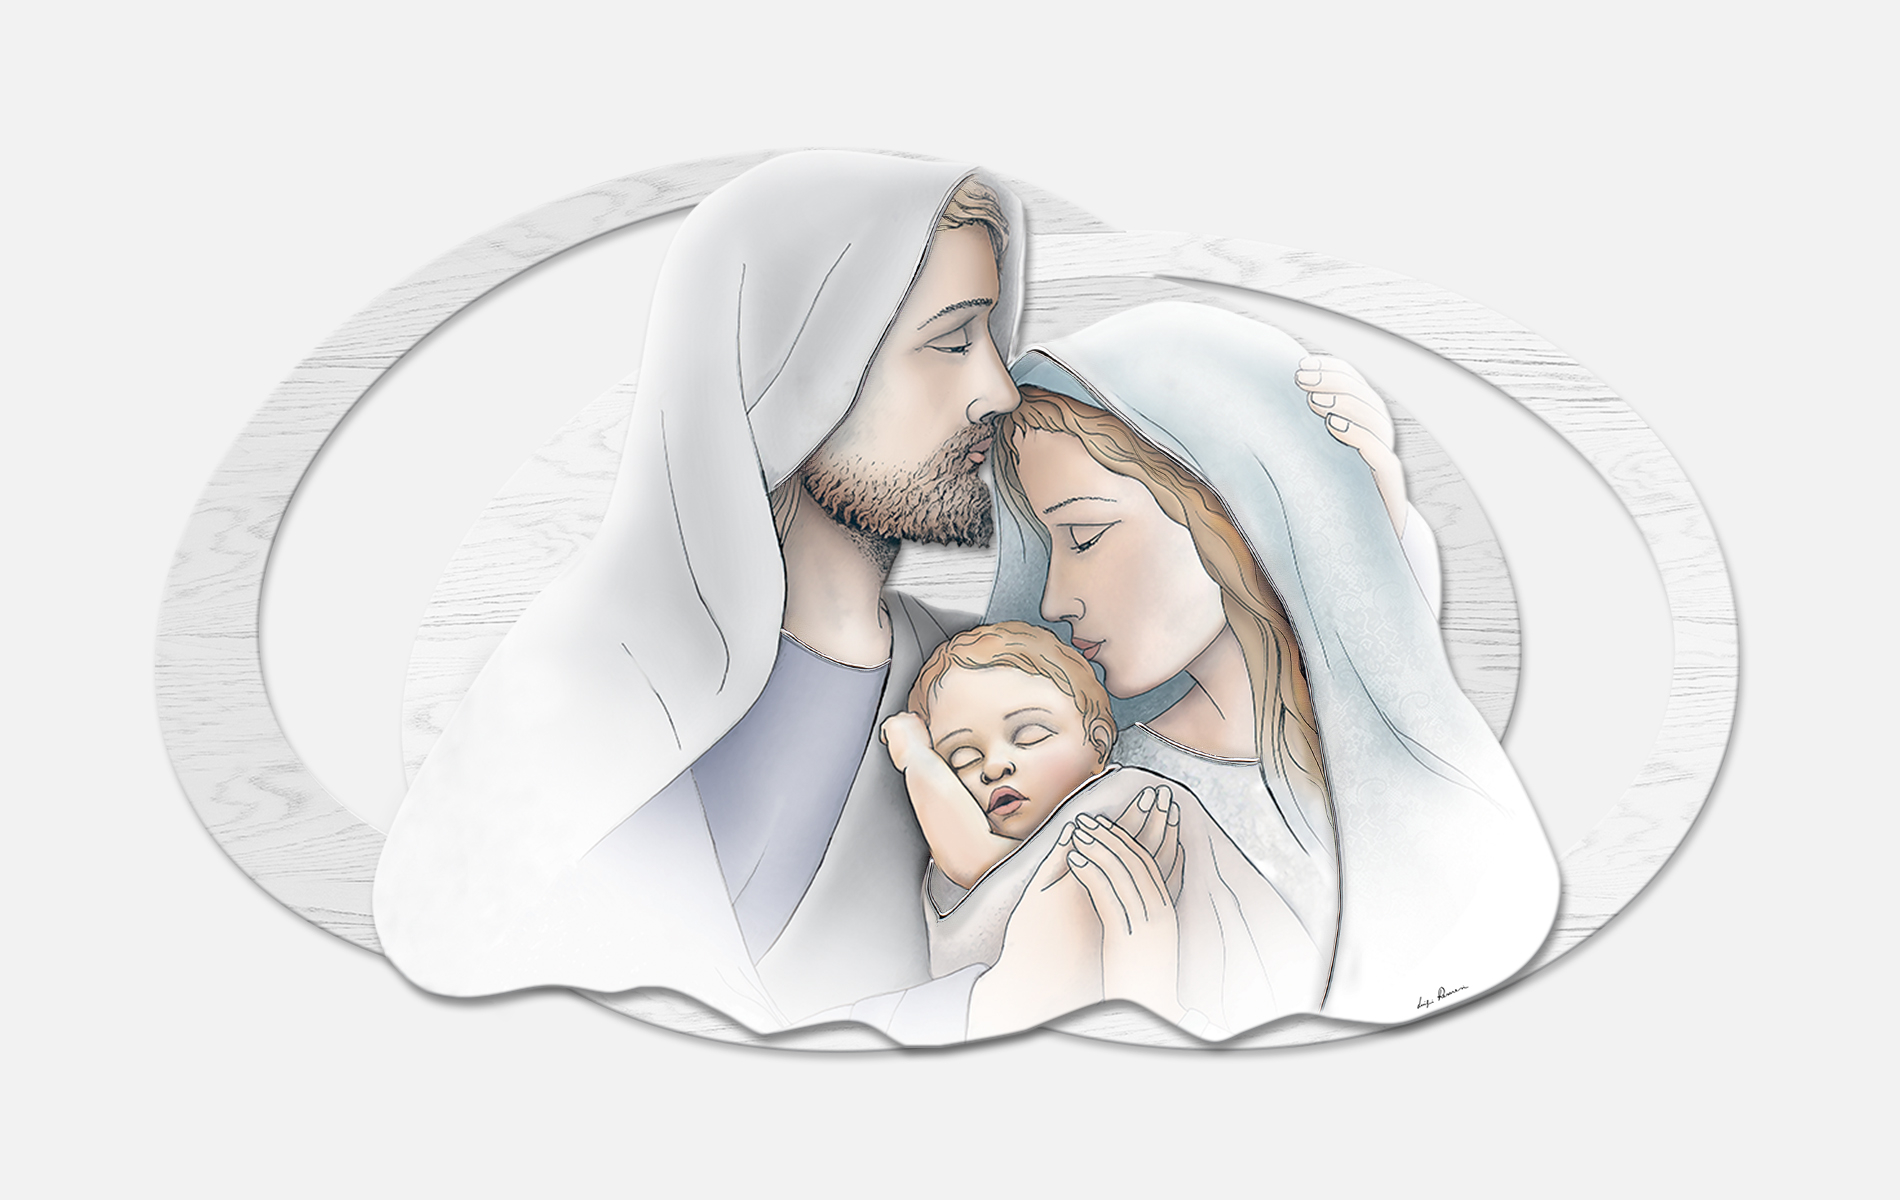 Capoletto moderno  Sacra Famiglia Estego a doppio livello 0515170.3